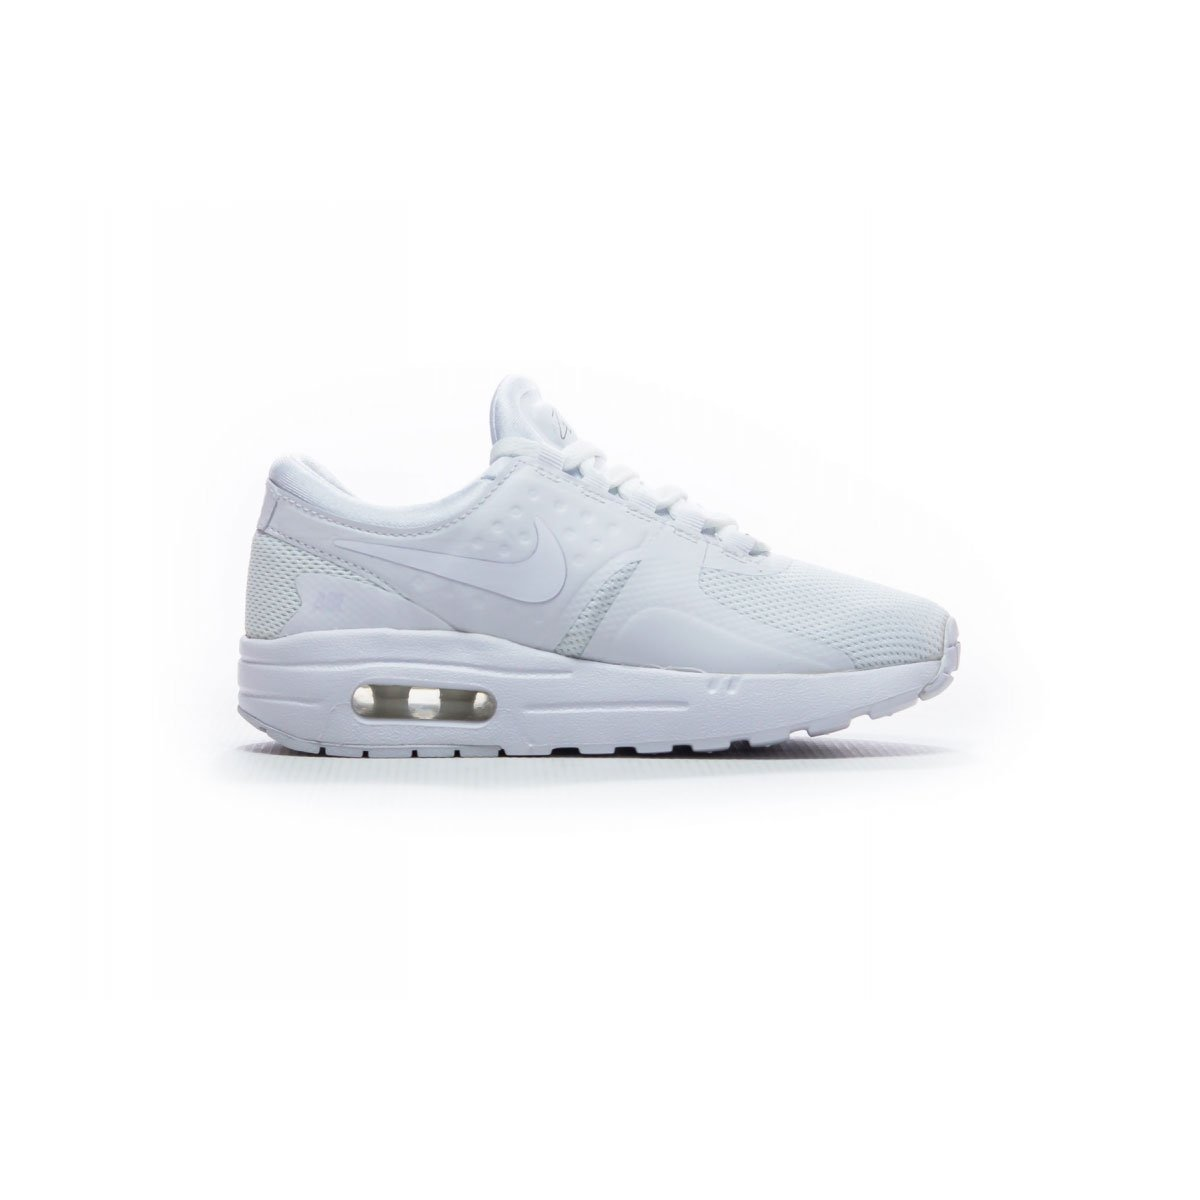 Nike Kids Air Max Zero Essential PS White 881226-100 (Size: 2.5Y)